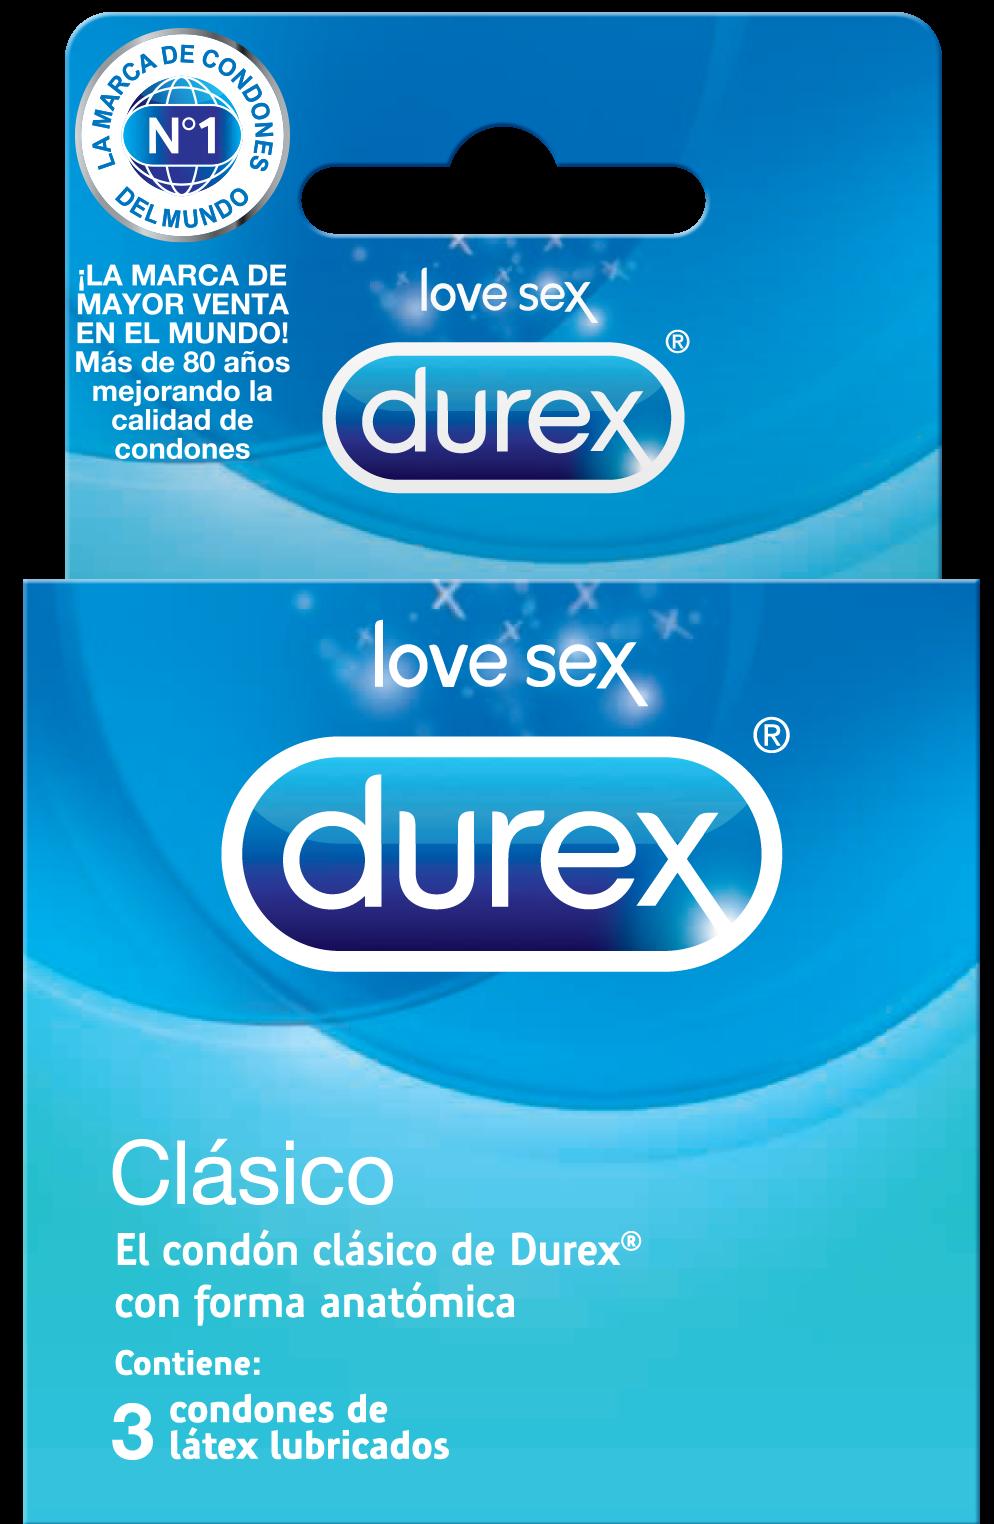 Durex® Clásico